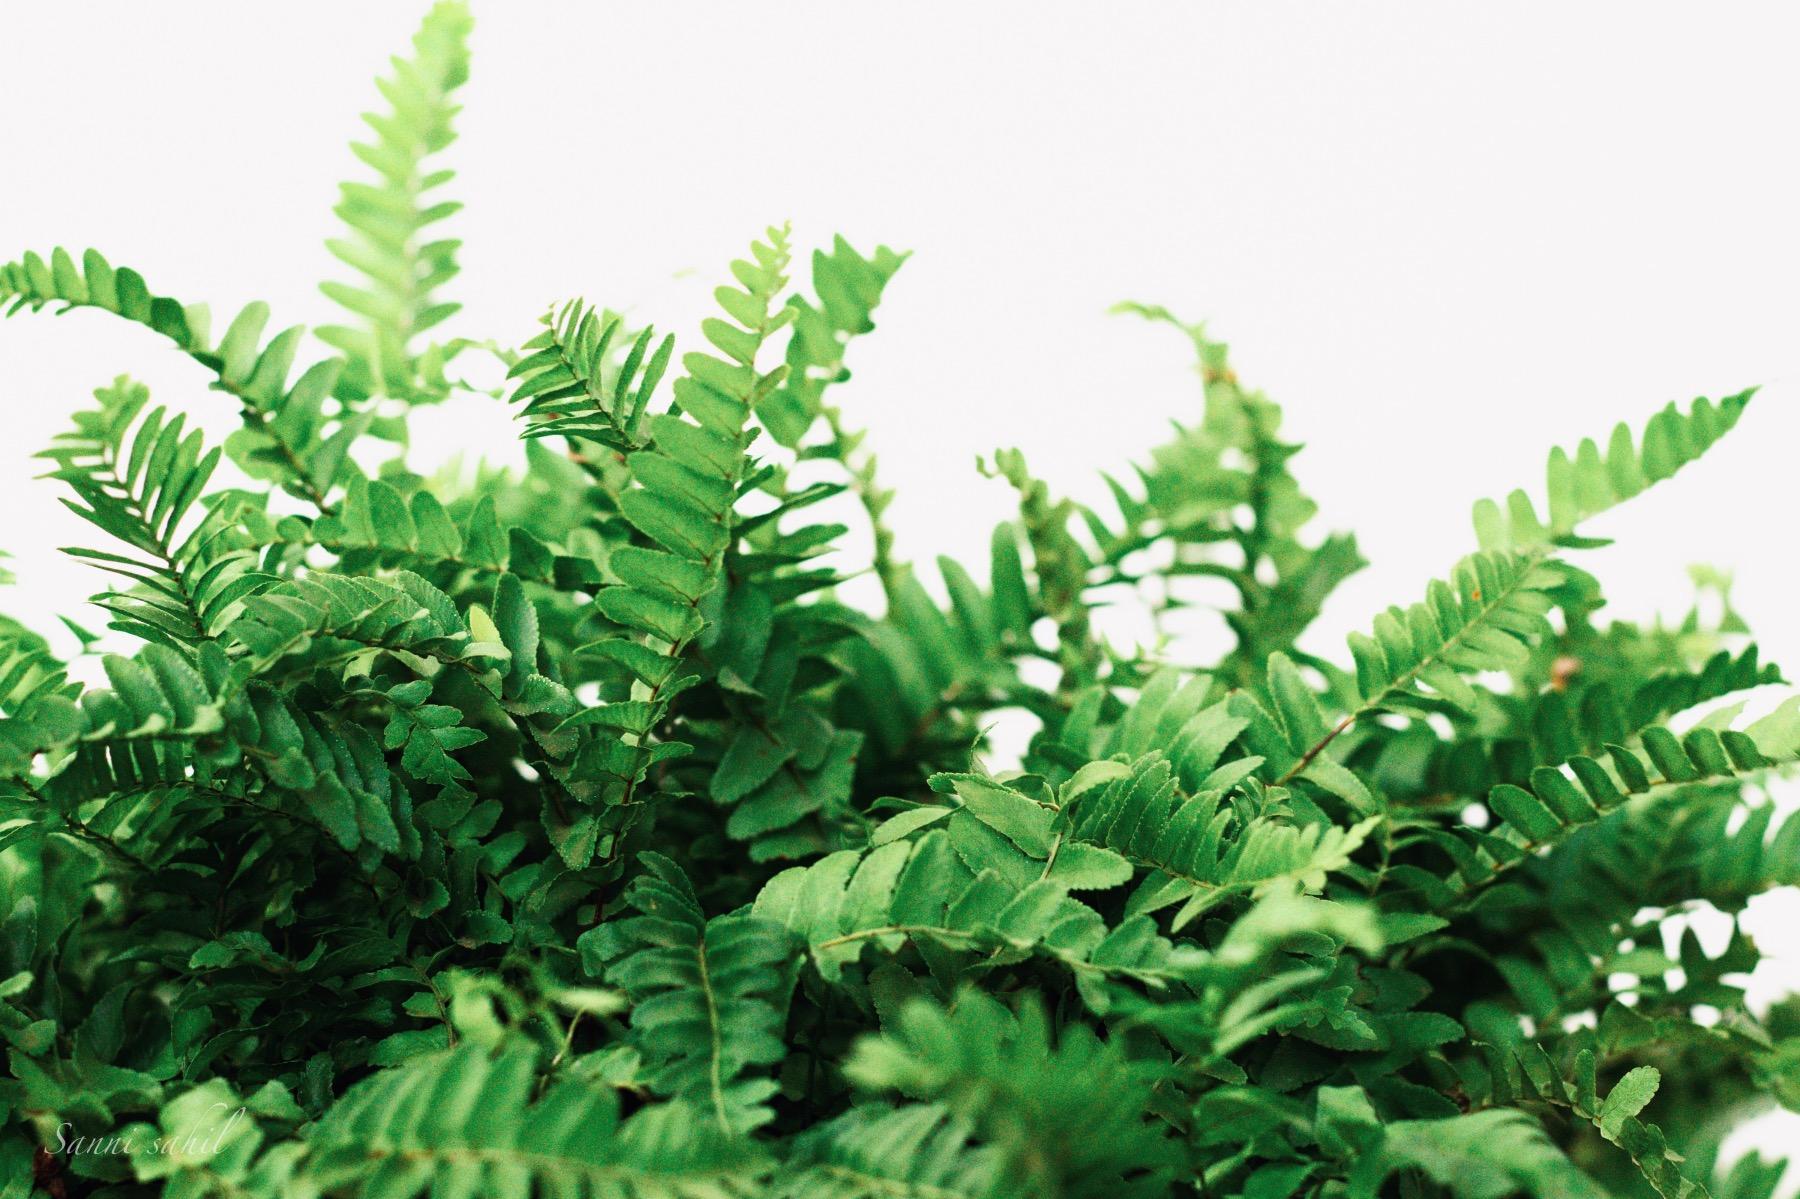 fern plants care guide gardening tutorial pop shop america